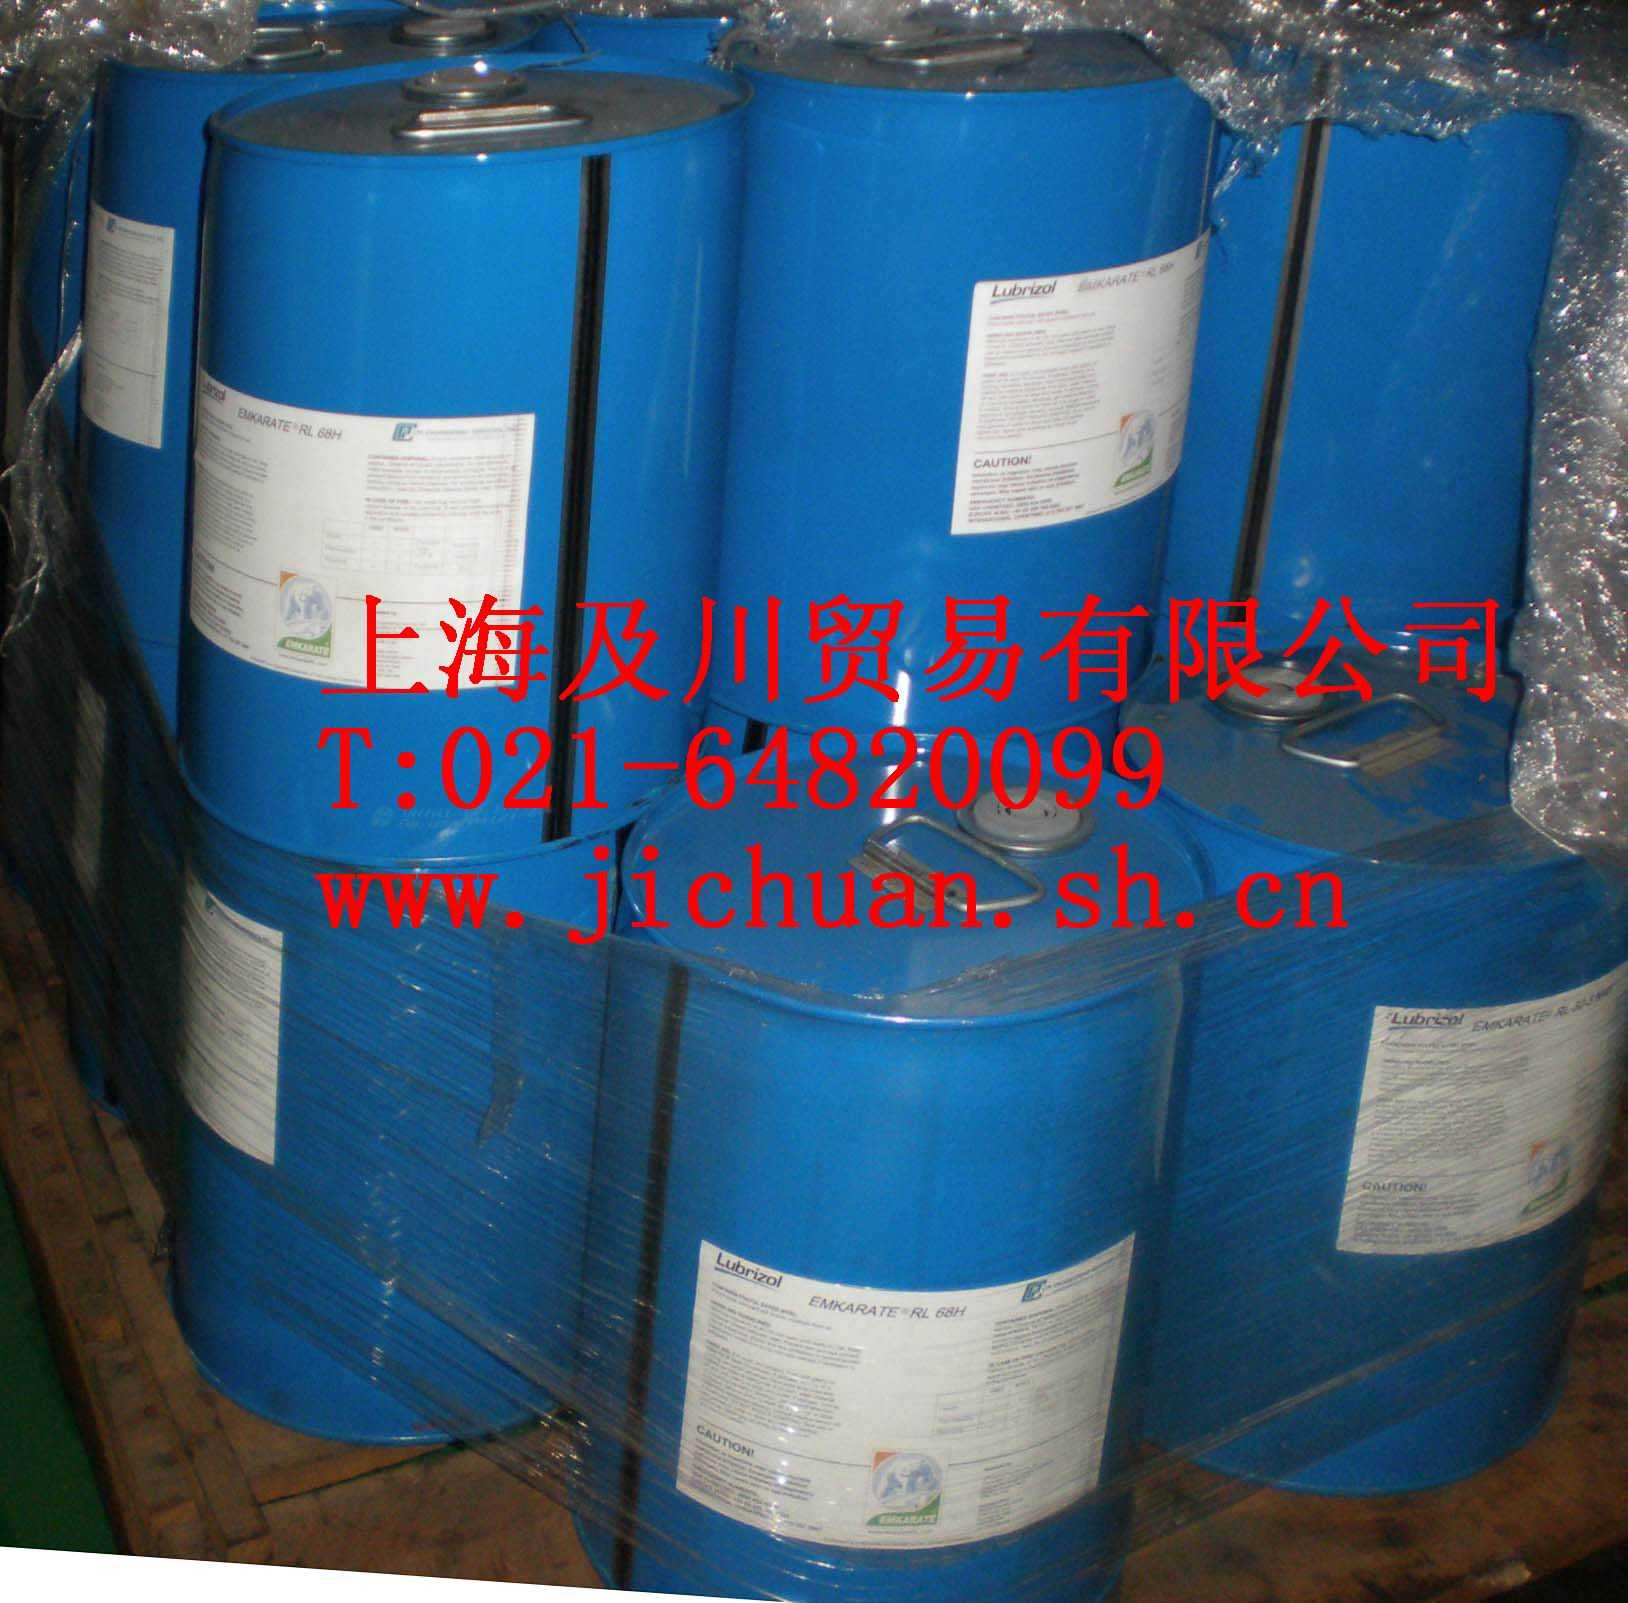 EmkarateRL46H冷冻油,上海及川贸易有限公司